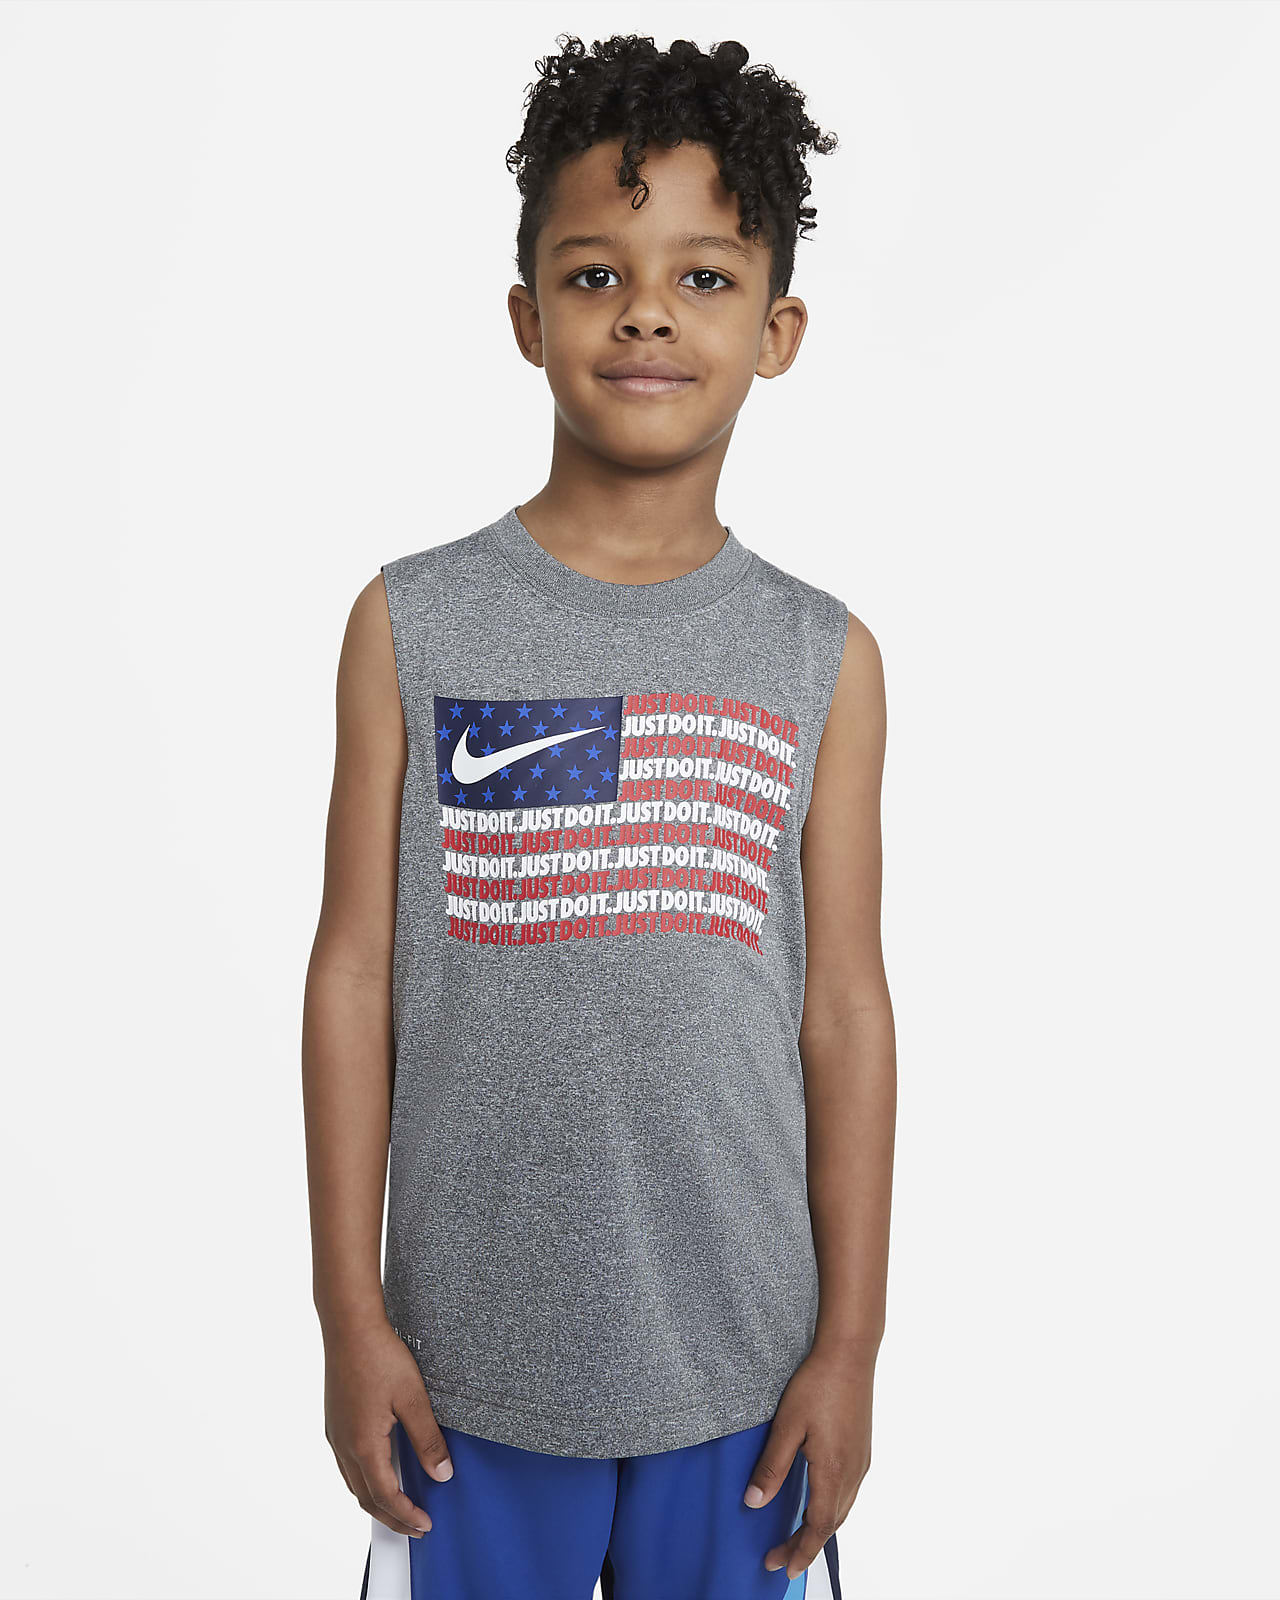 Camiseta de tirantes Nike Dri-FIT para niños talla pequeña